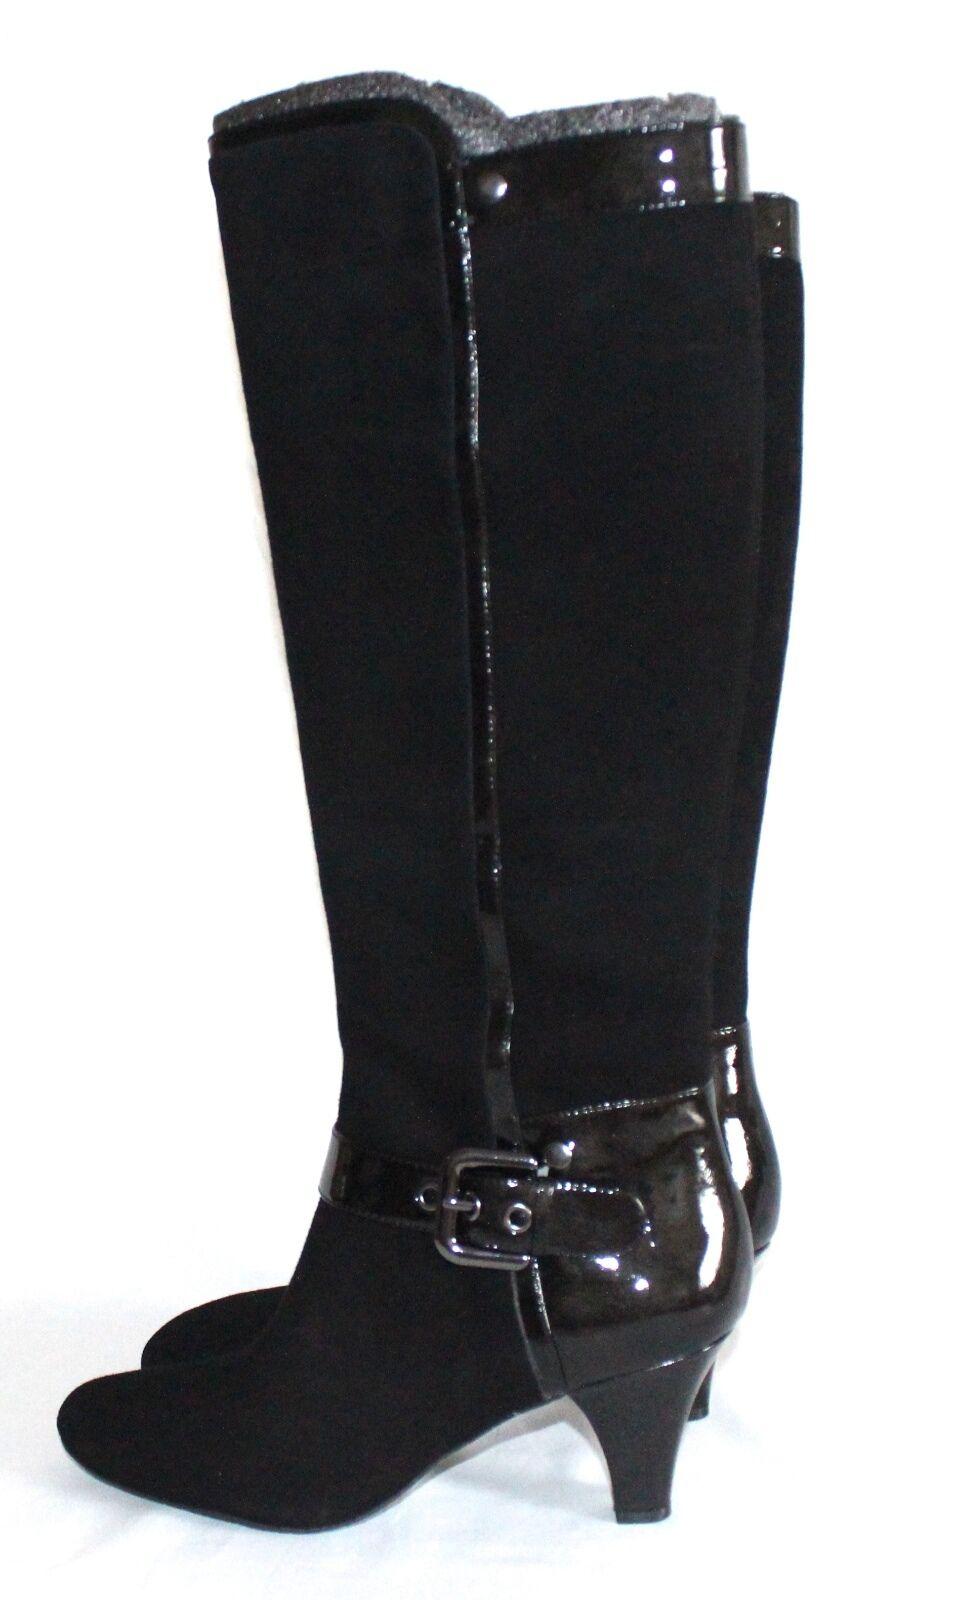 Boots for women Circa Joan&David  Size 9M